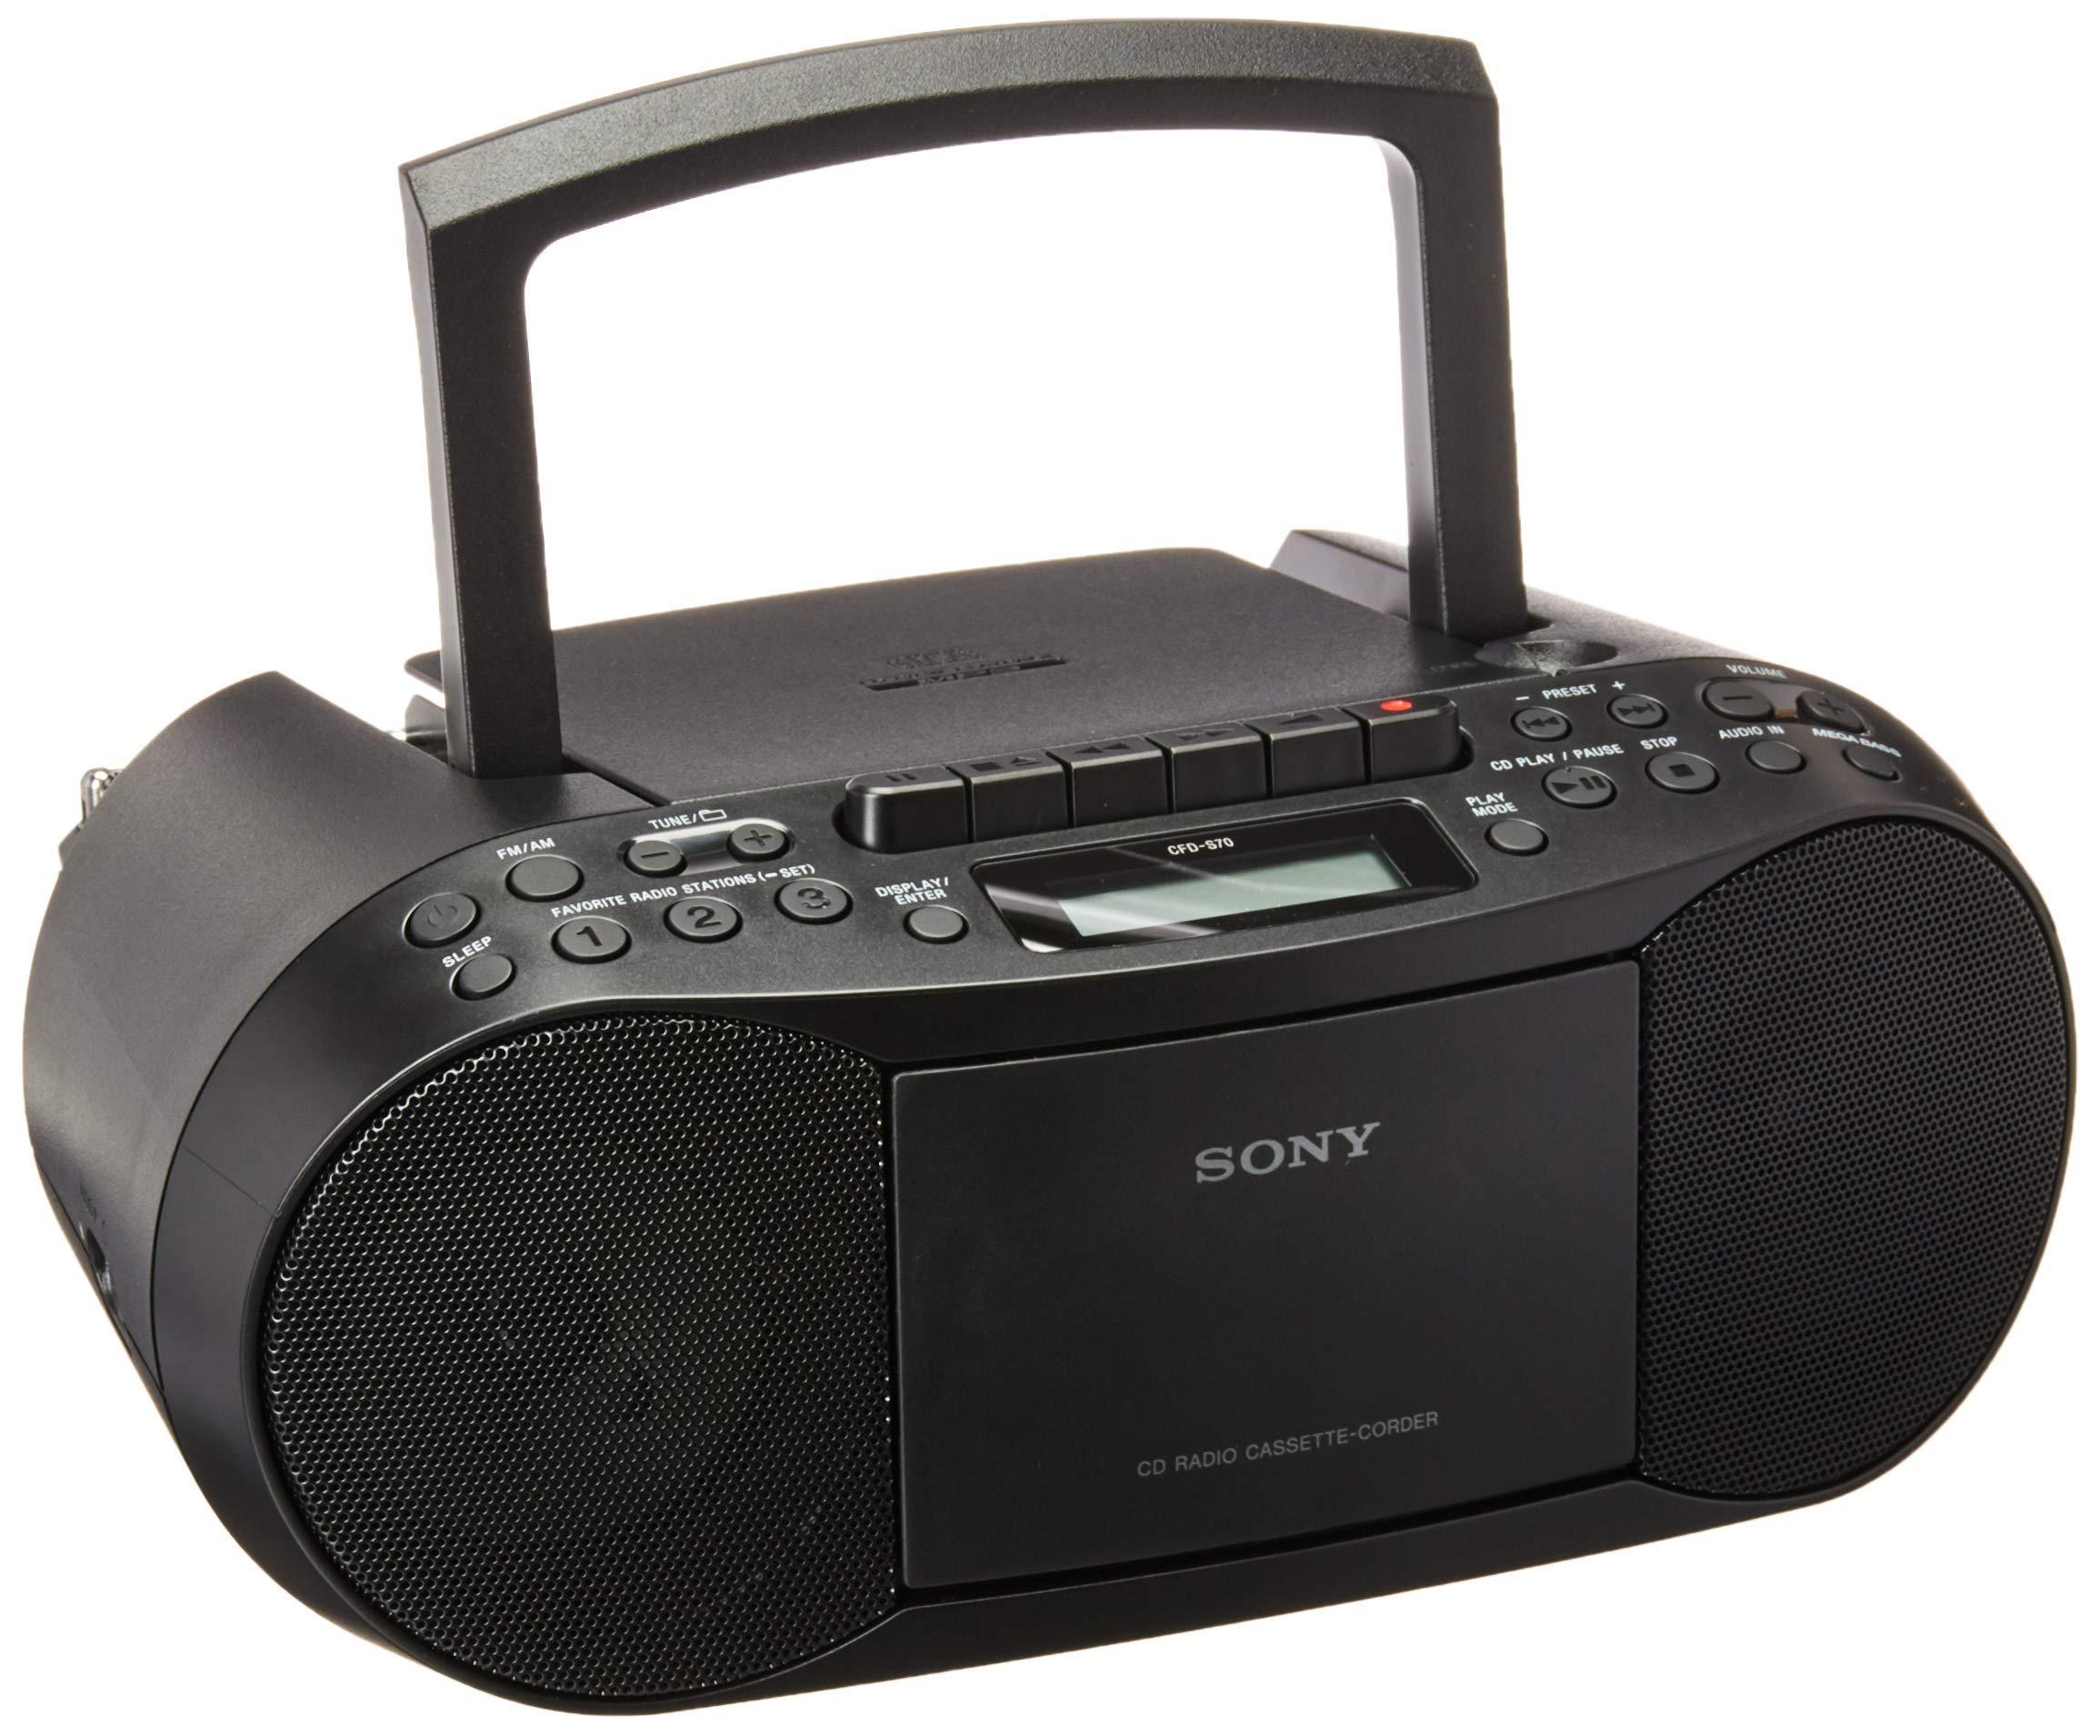 Sony CFDS70 BLK Cassette Boombox Renewed